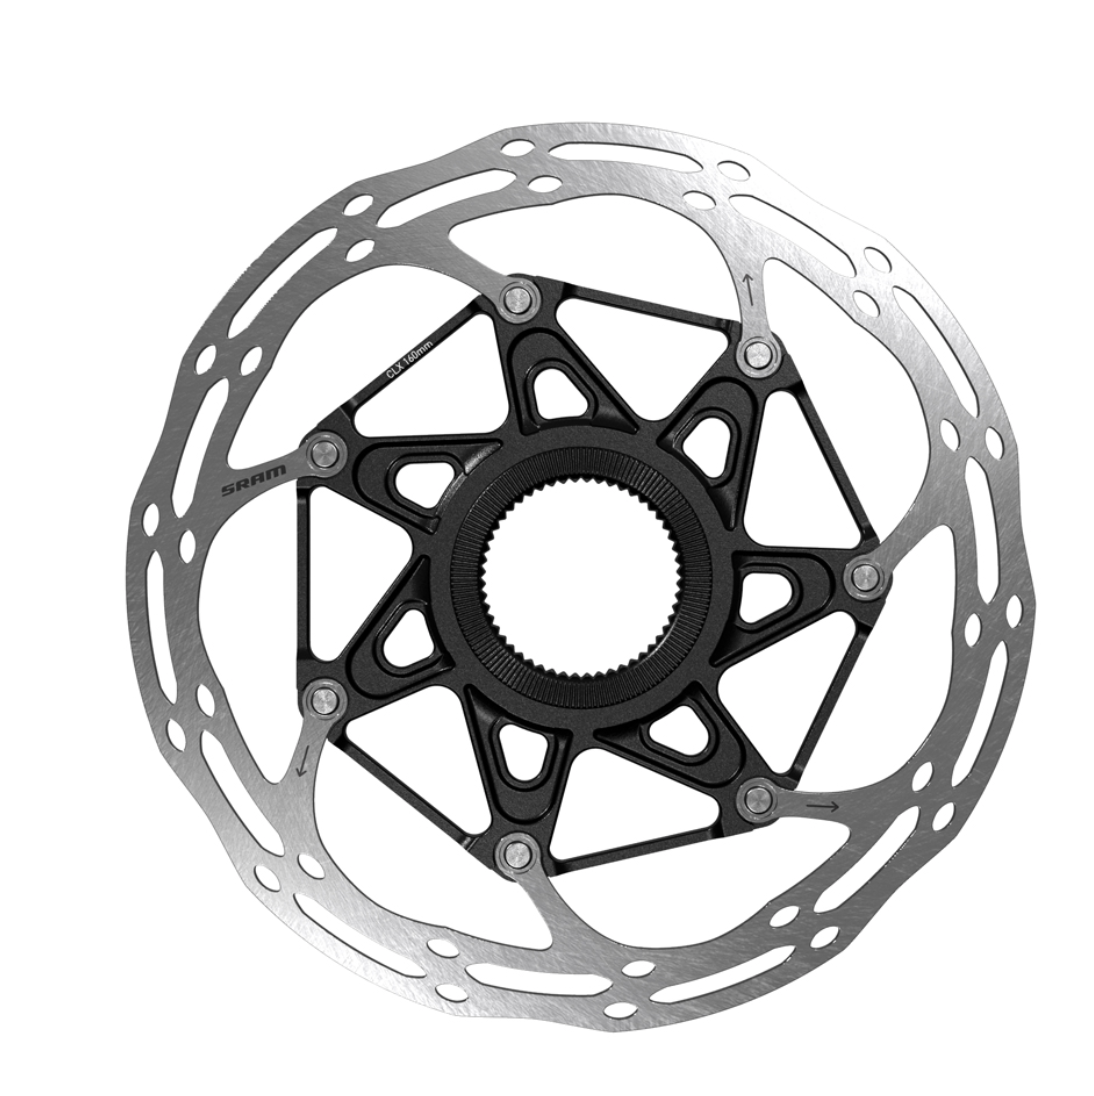 SRAM SRAM Centerline X Rotor